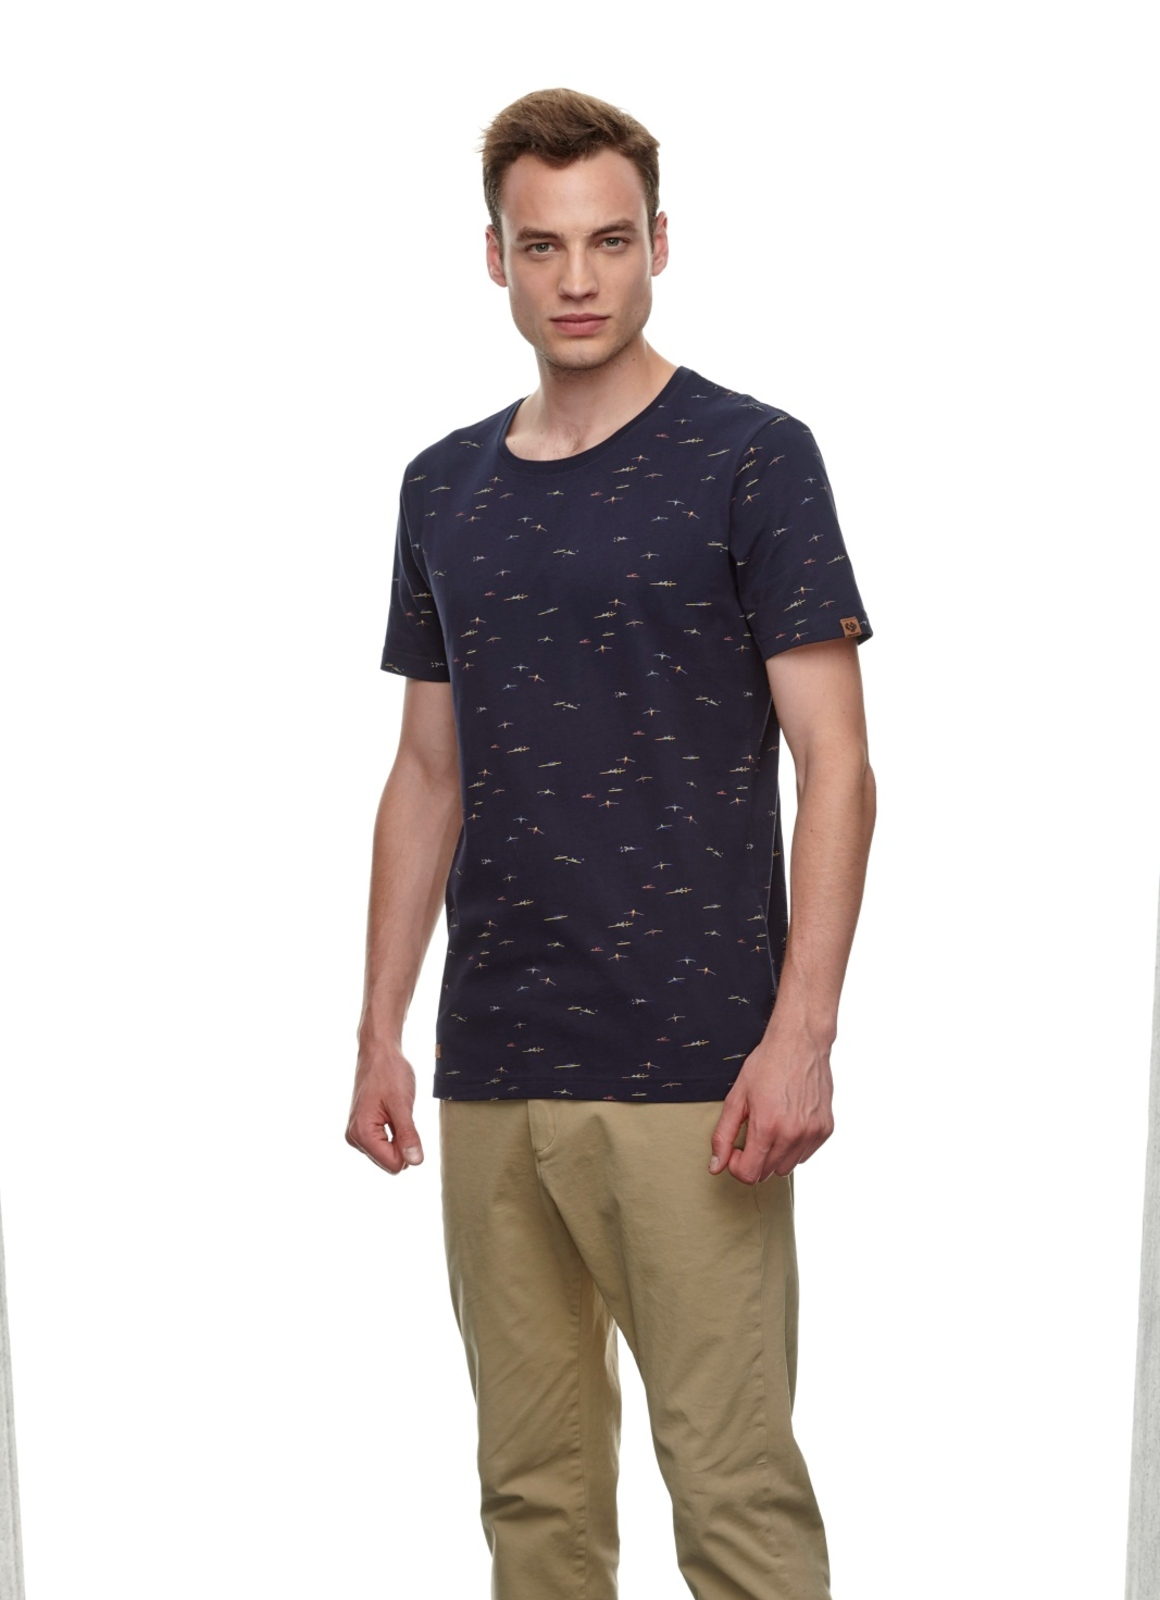 Ragwear Herren T-Shirt Taylor blau Allover Print 2112 15010 2028 navy